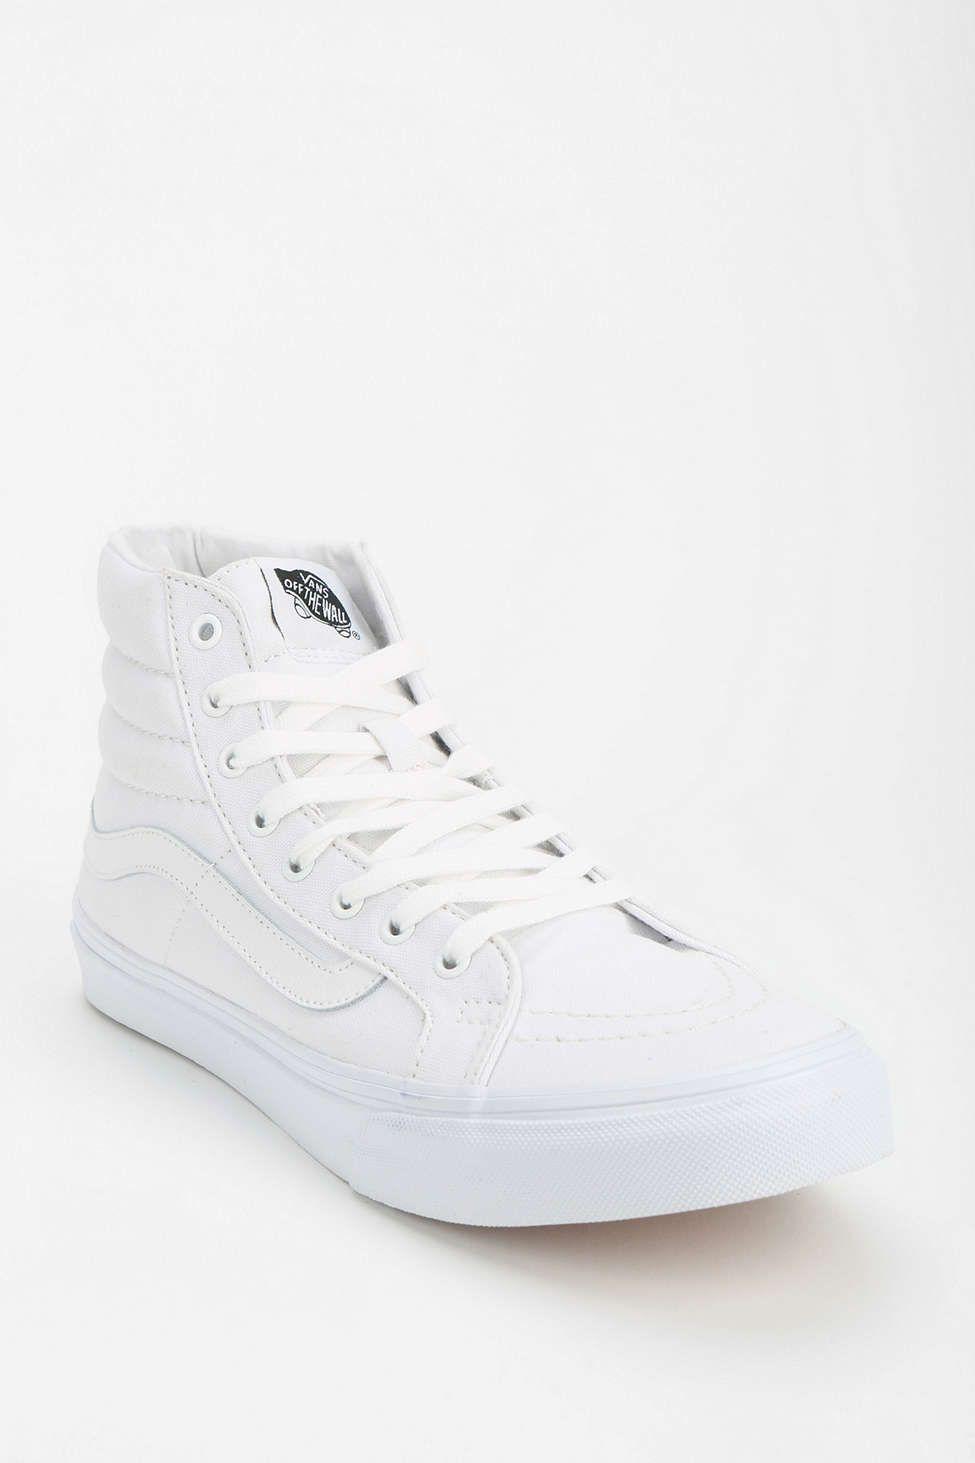 e6977fe9a739e9 Vans  Sk8-Hi Slim Tonal Women s Sneaker in